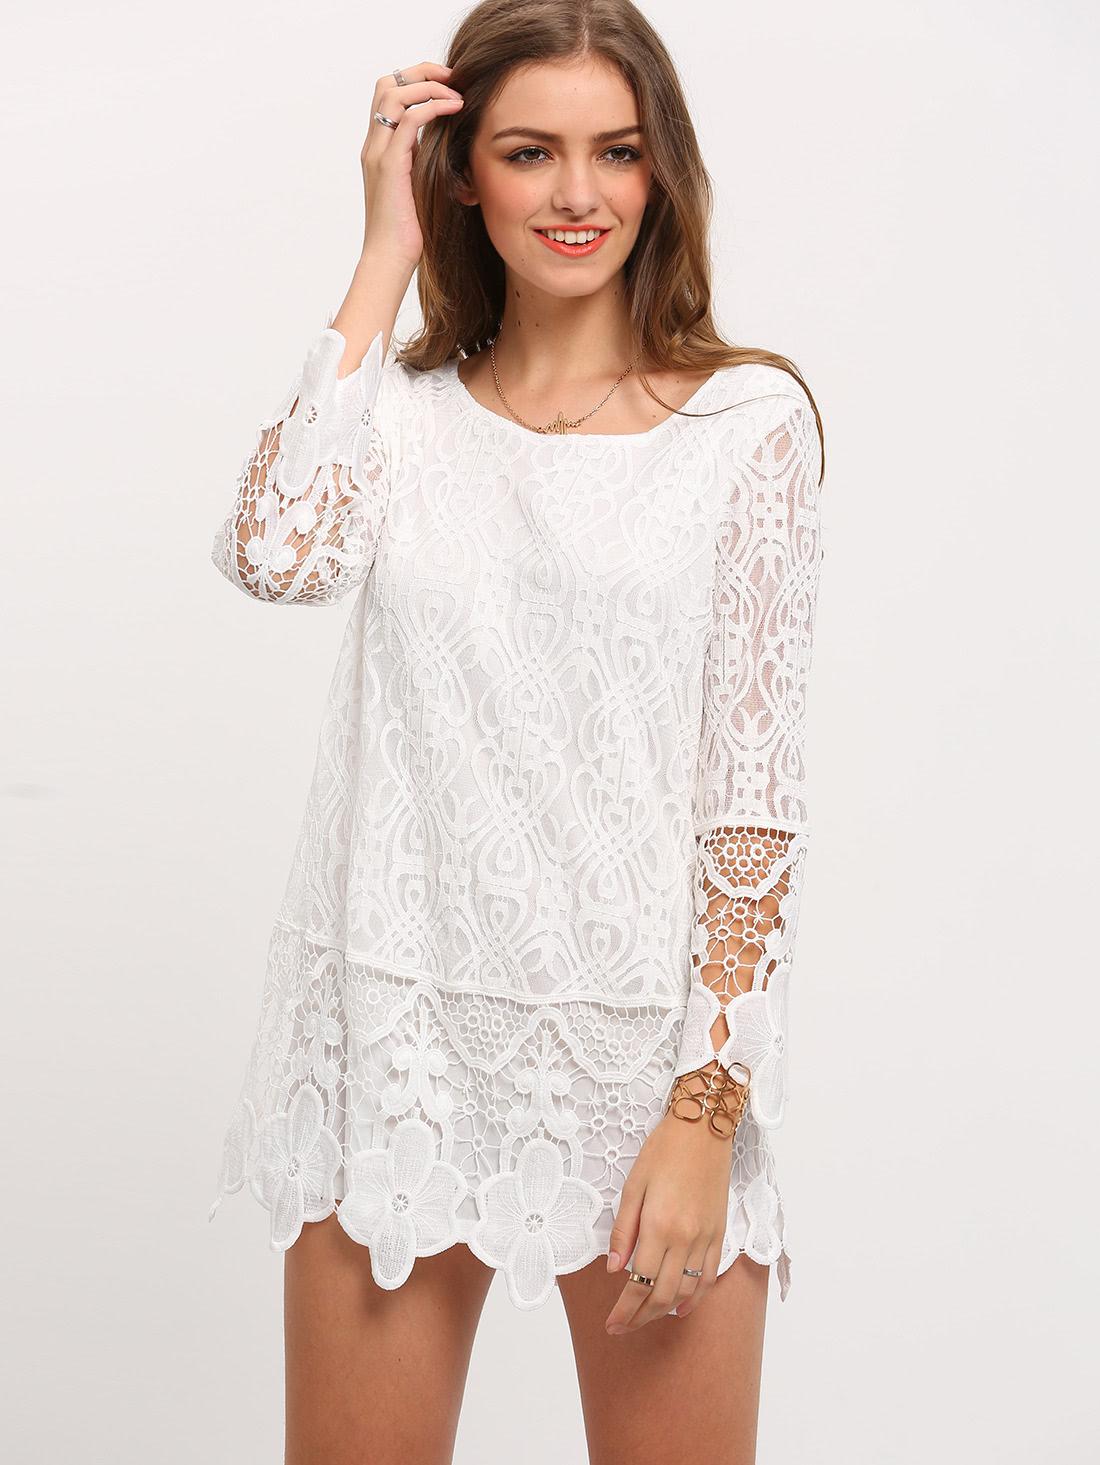 Wedding White Long Sleeve Dress white long sleeve crochet lace dress